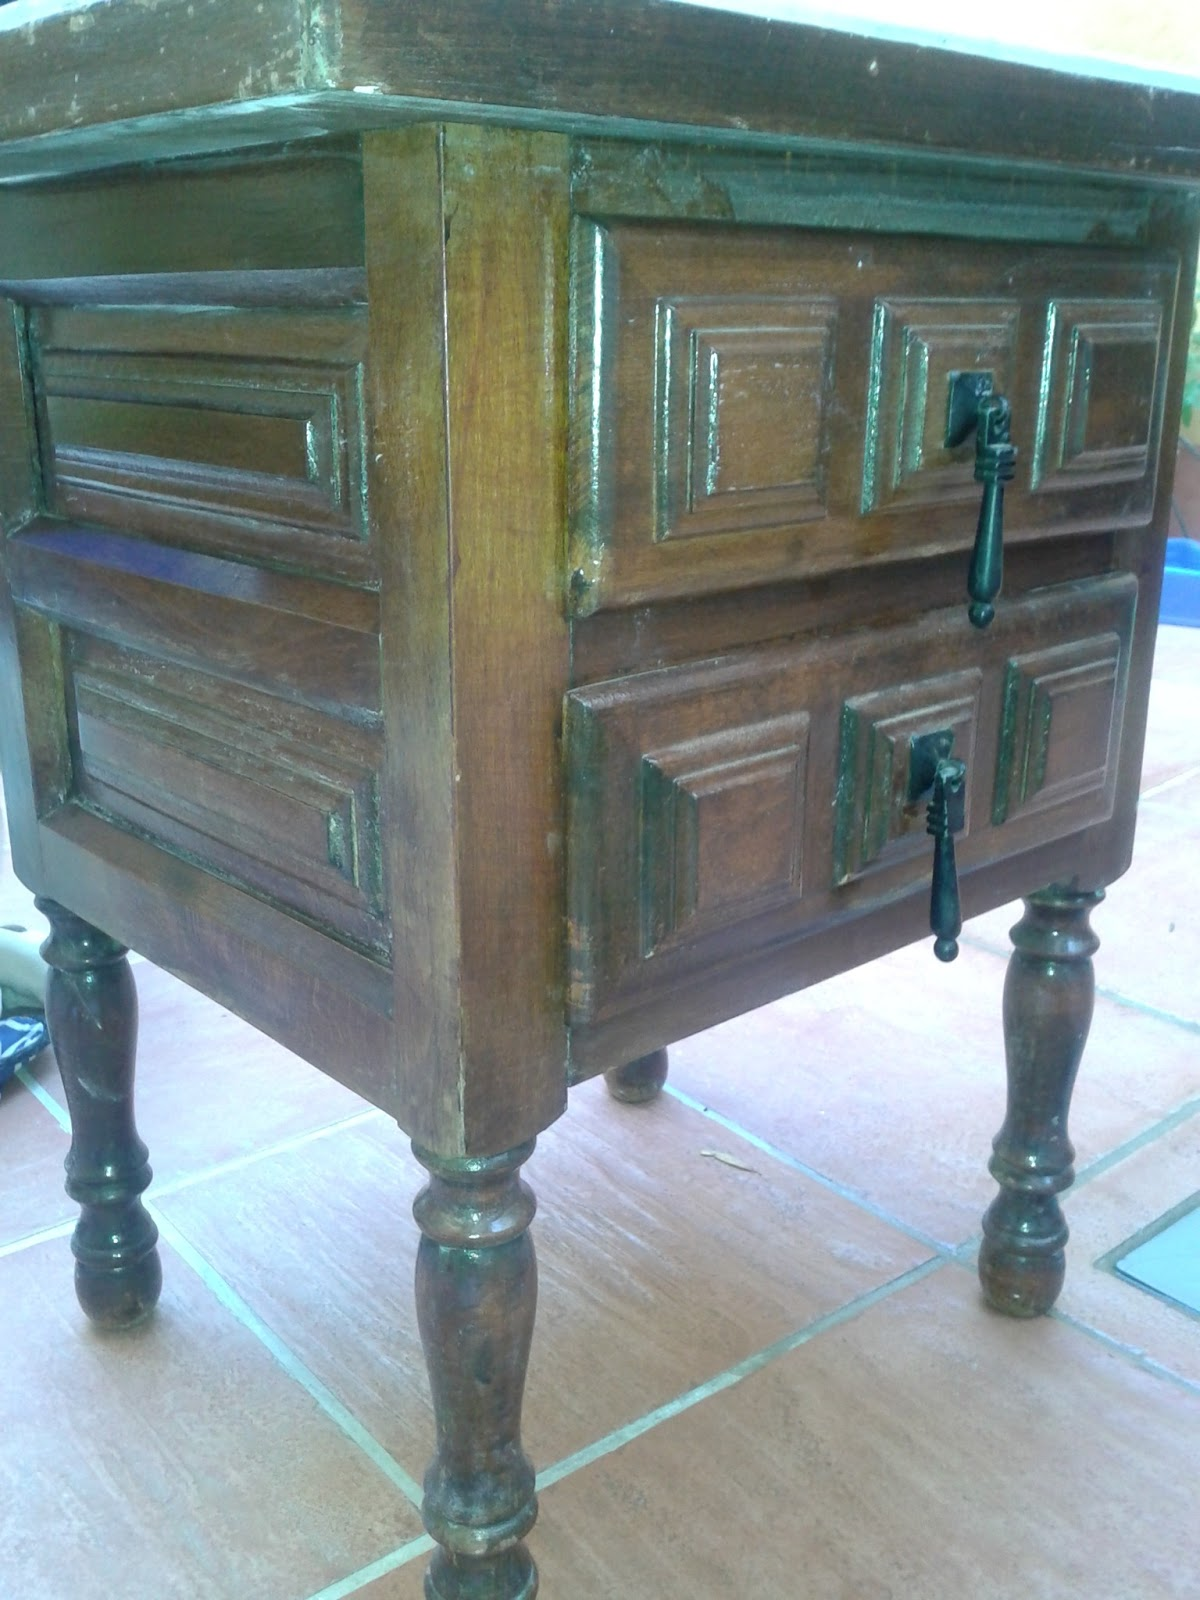 Crizank mosaicos quieres modernizar tus muebles o - Modernizar muebles antiguos ...